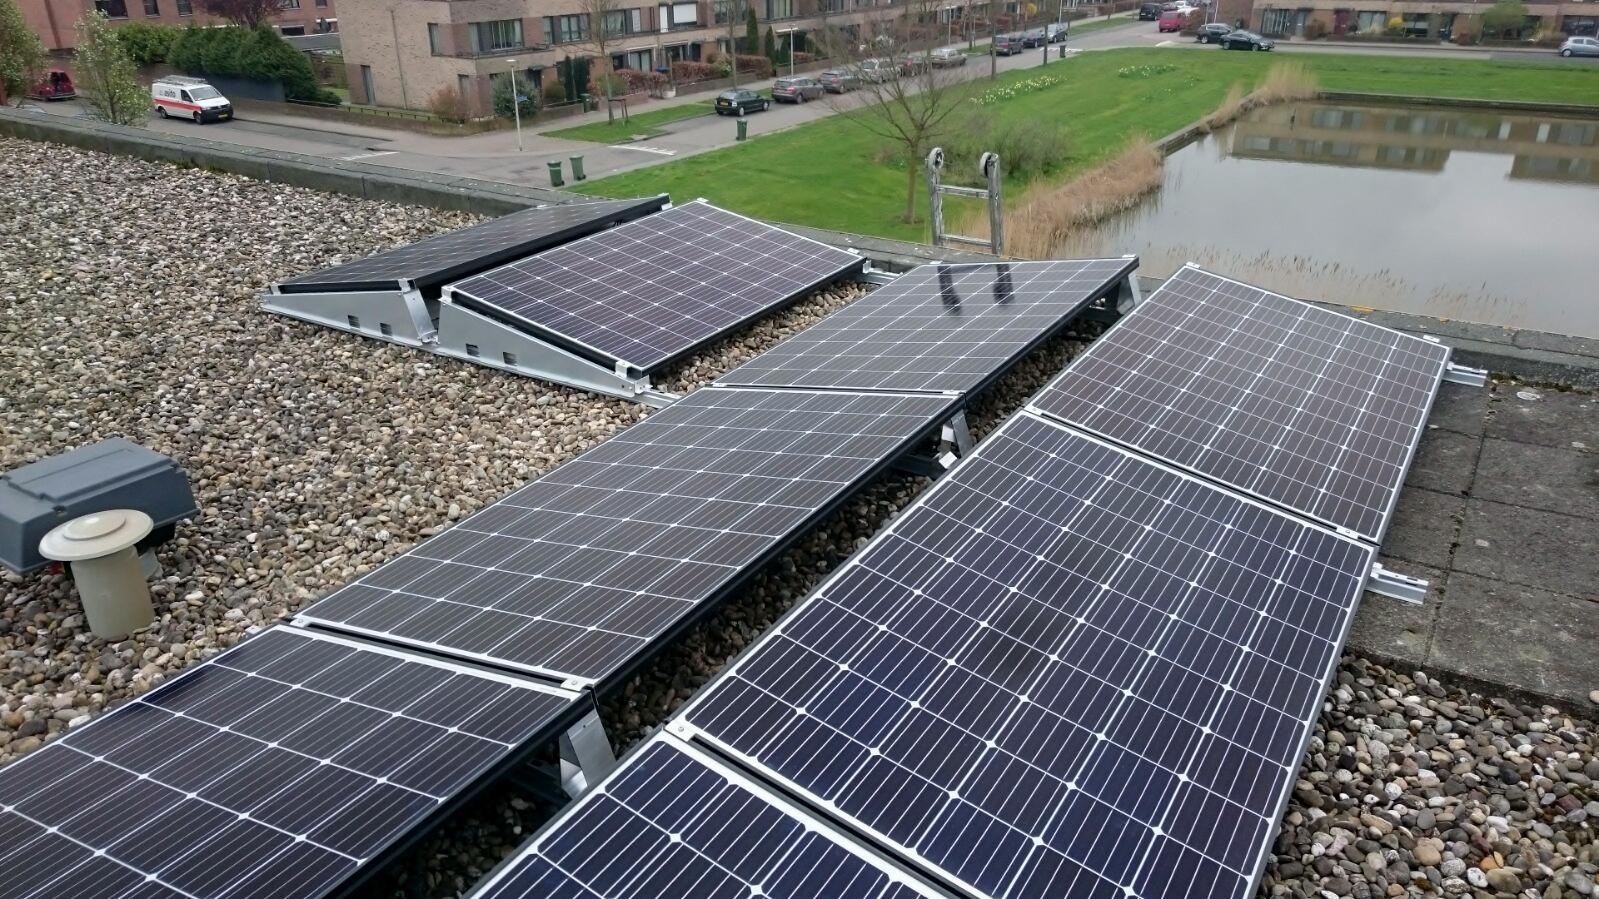 zonnepanelen op platdak oostwest gelegd